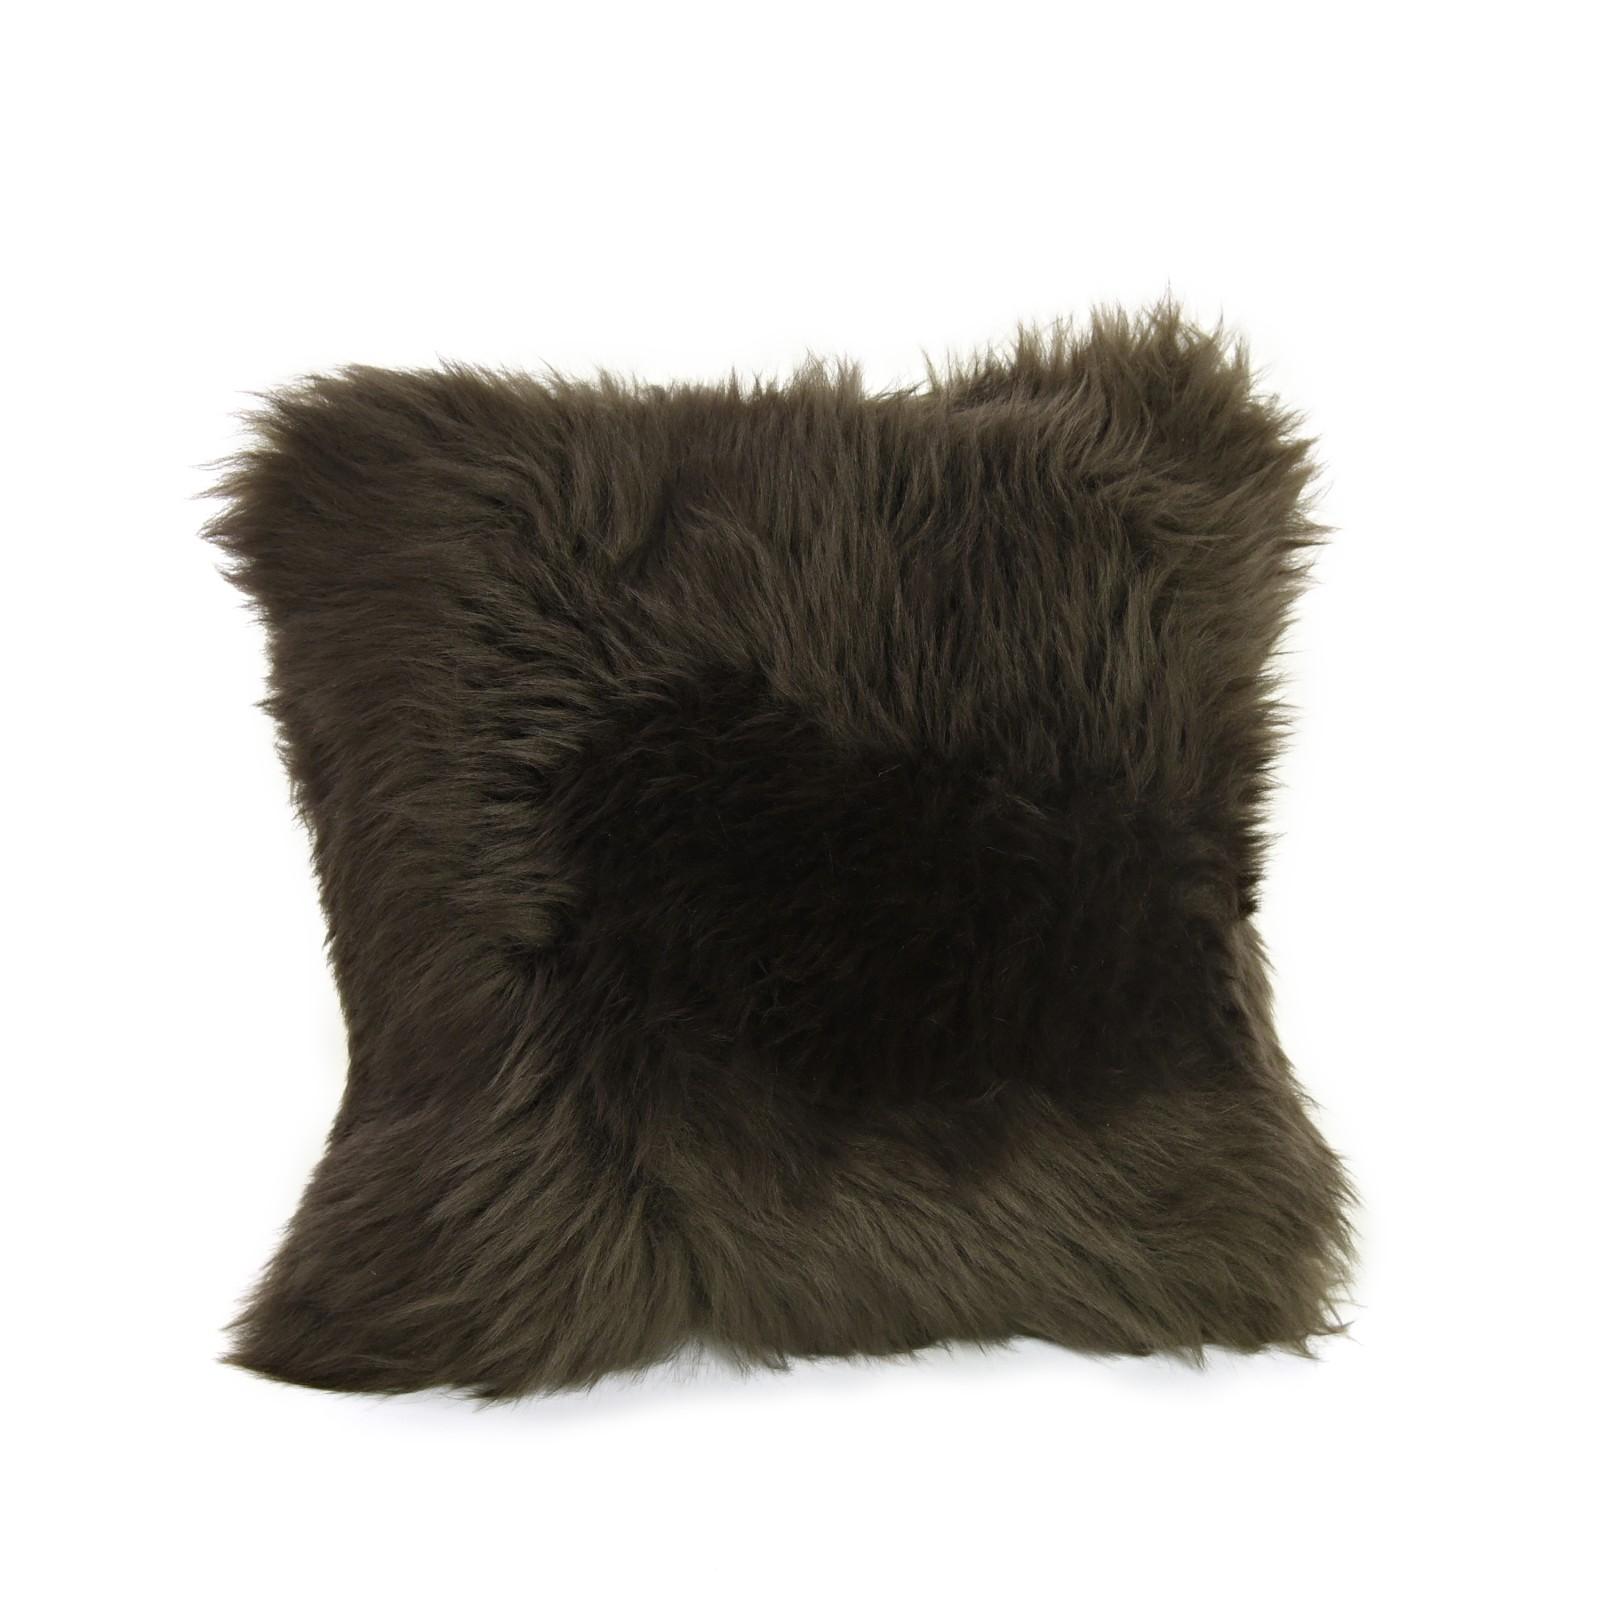 Square Sheepskin Cushion in Mink